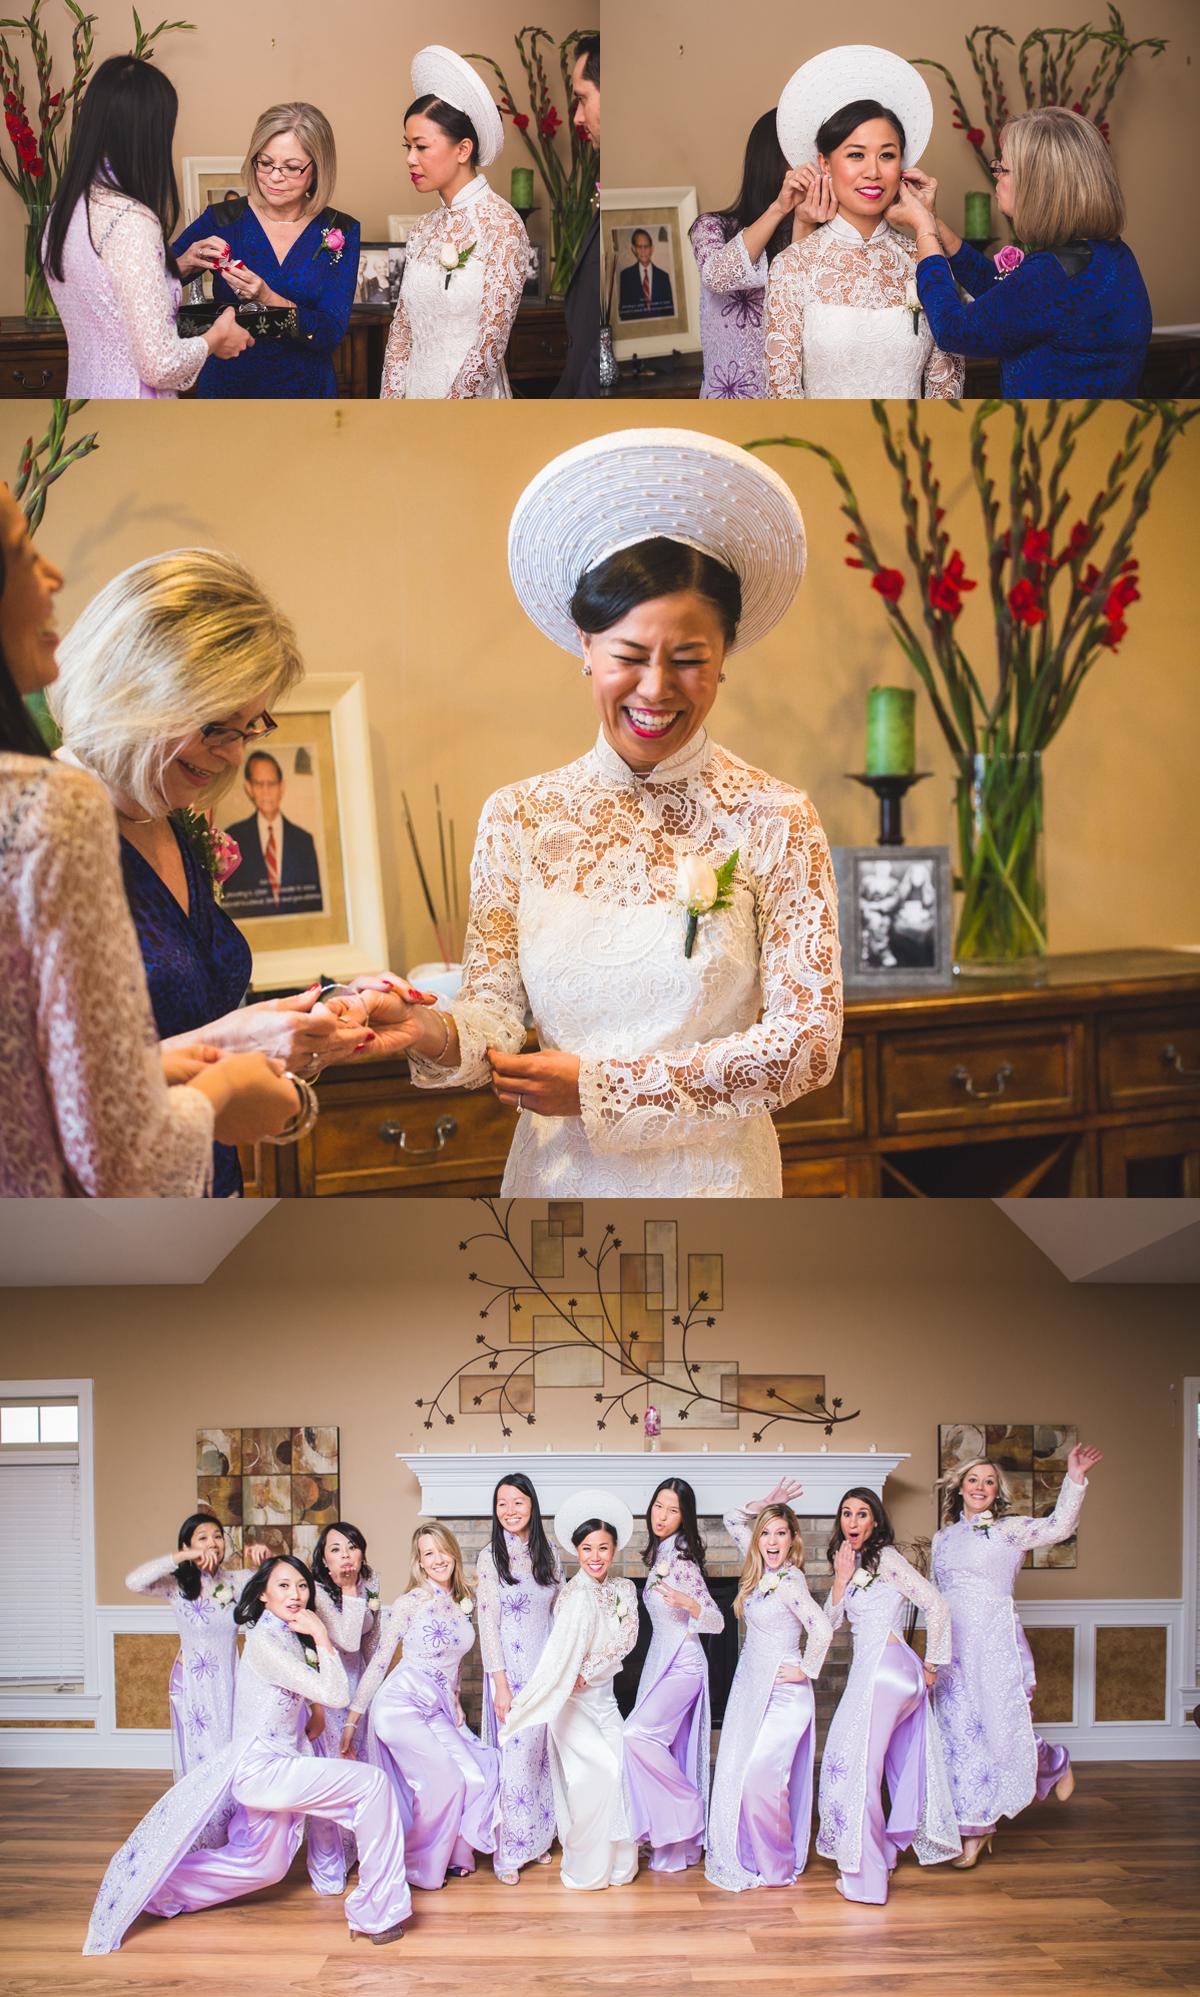 pittsburgh-wedding-photographer-kimly-james-heinz-chapel-pnc-lexus-club-tea-ceremony-4